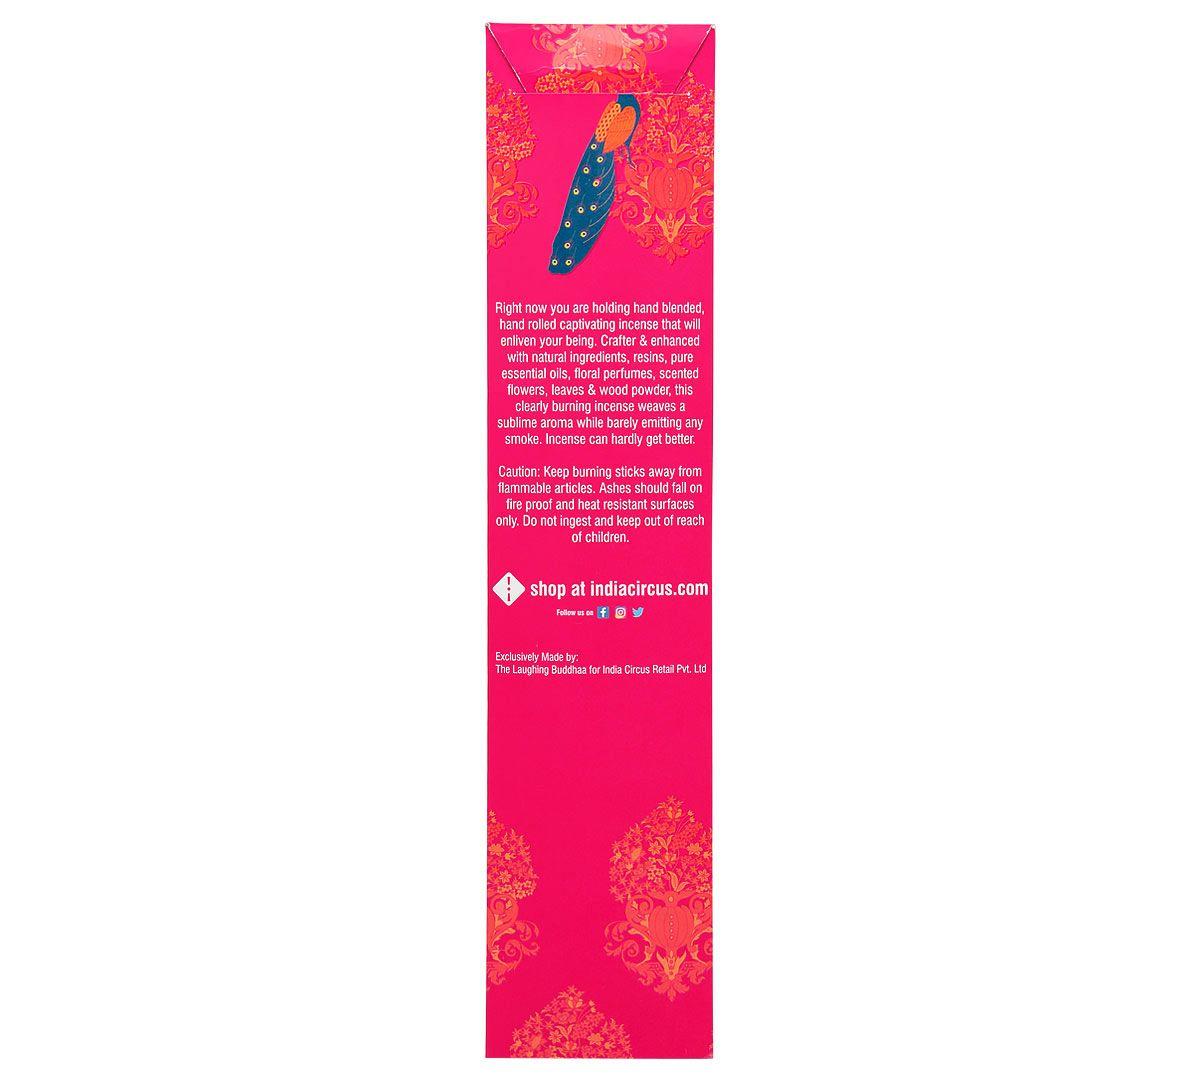 India Circus Pure Frnkincense Incense Stick